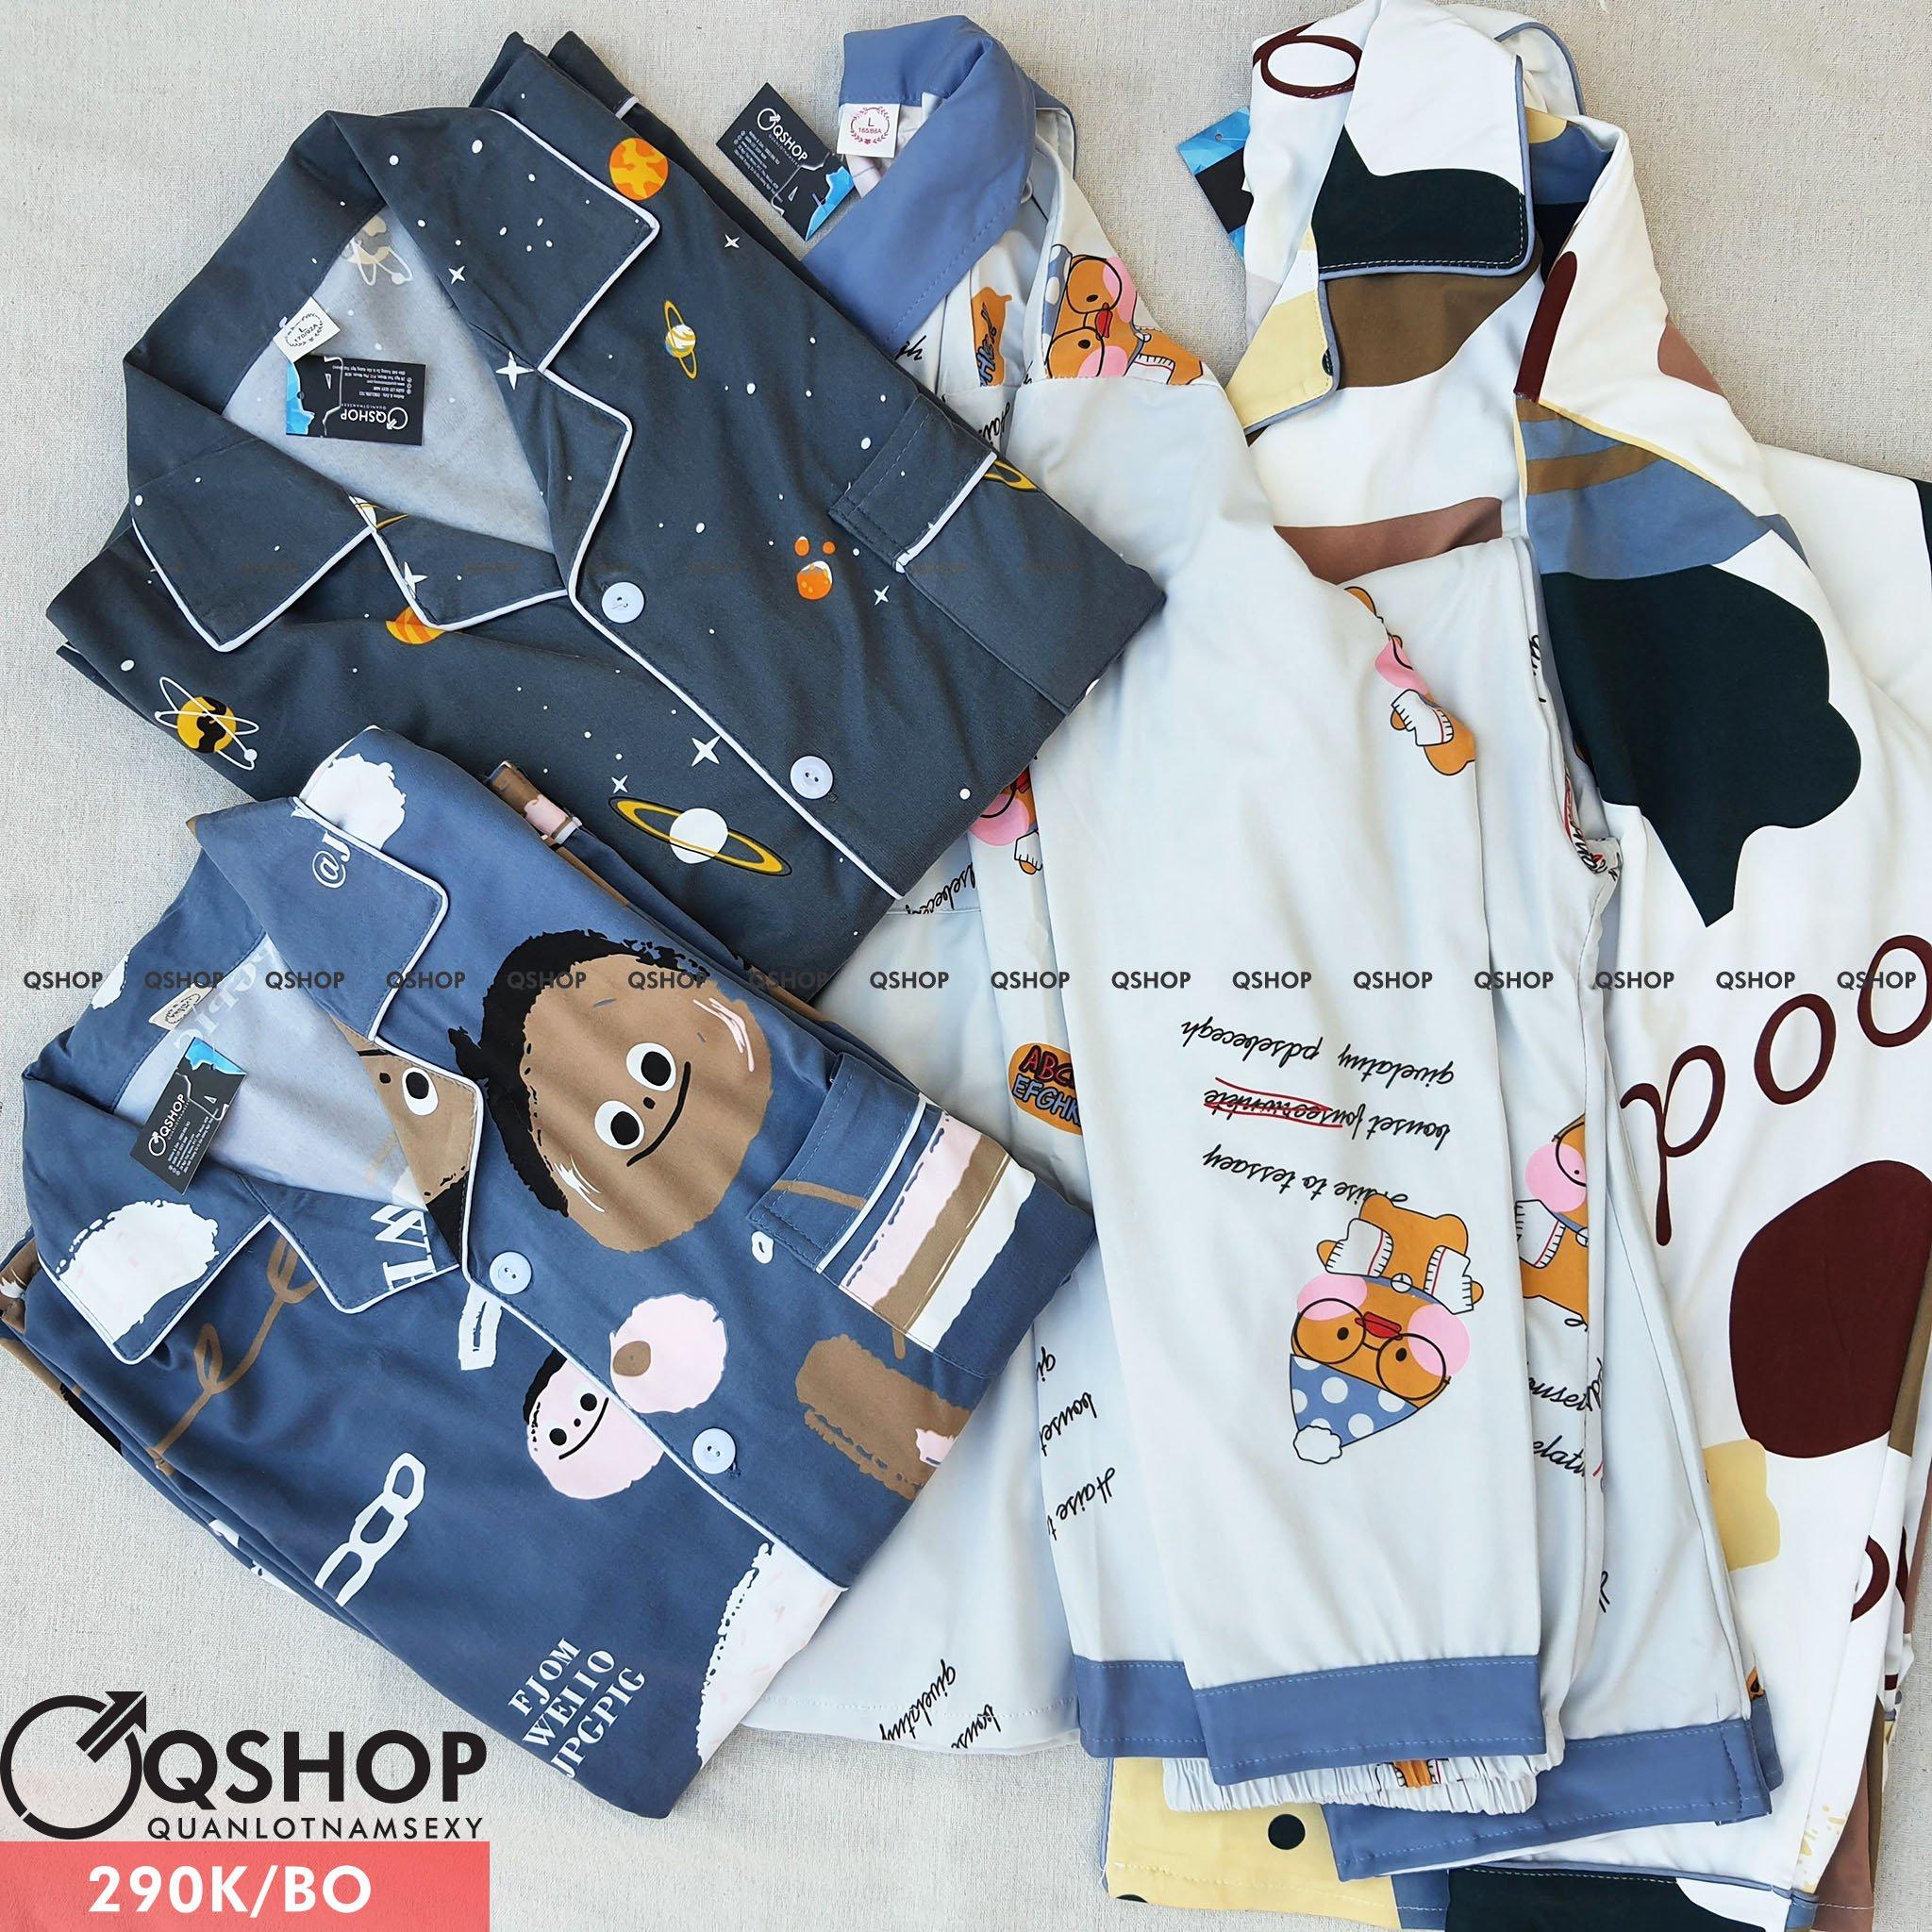 Bộ pijama nam thun cotton mềm mịn QM261